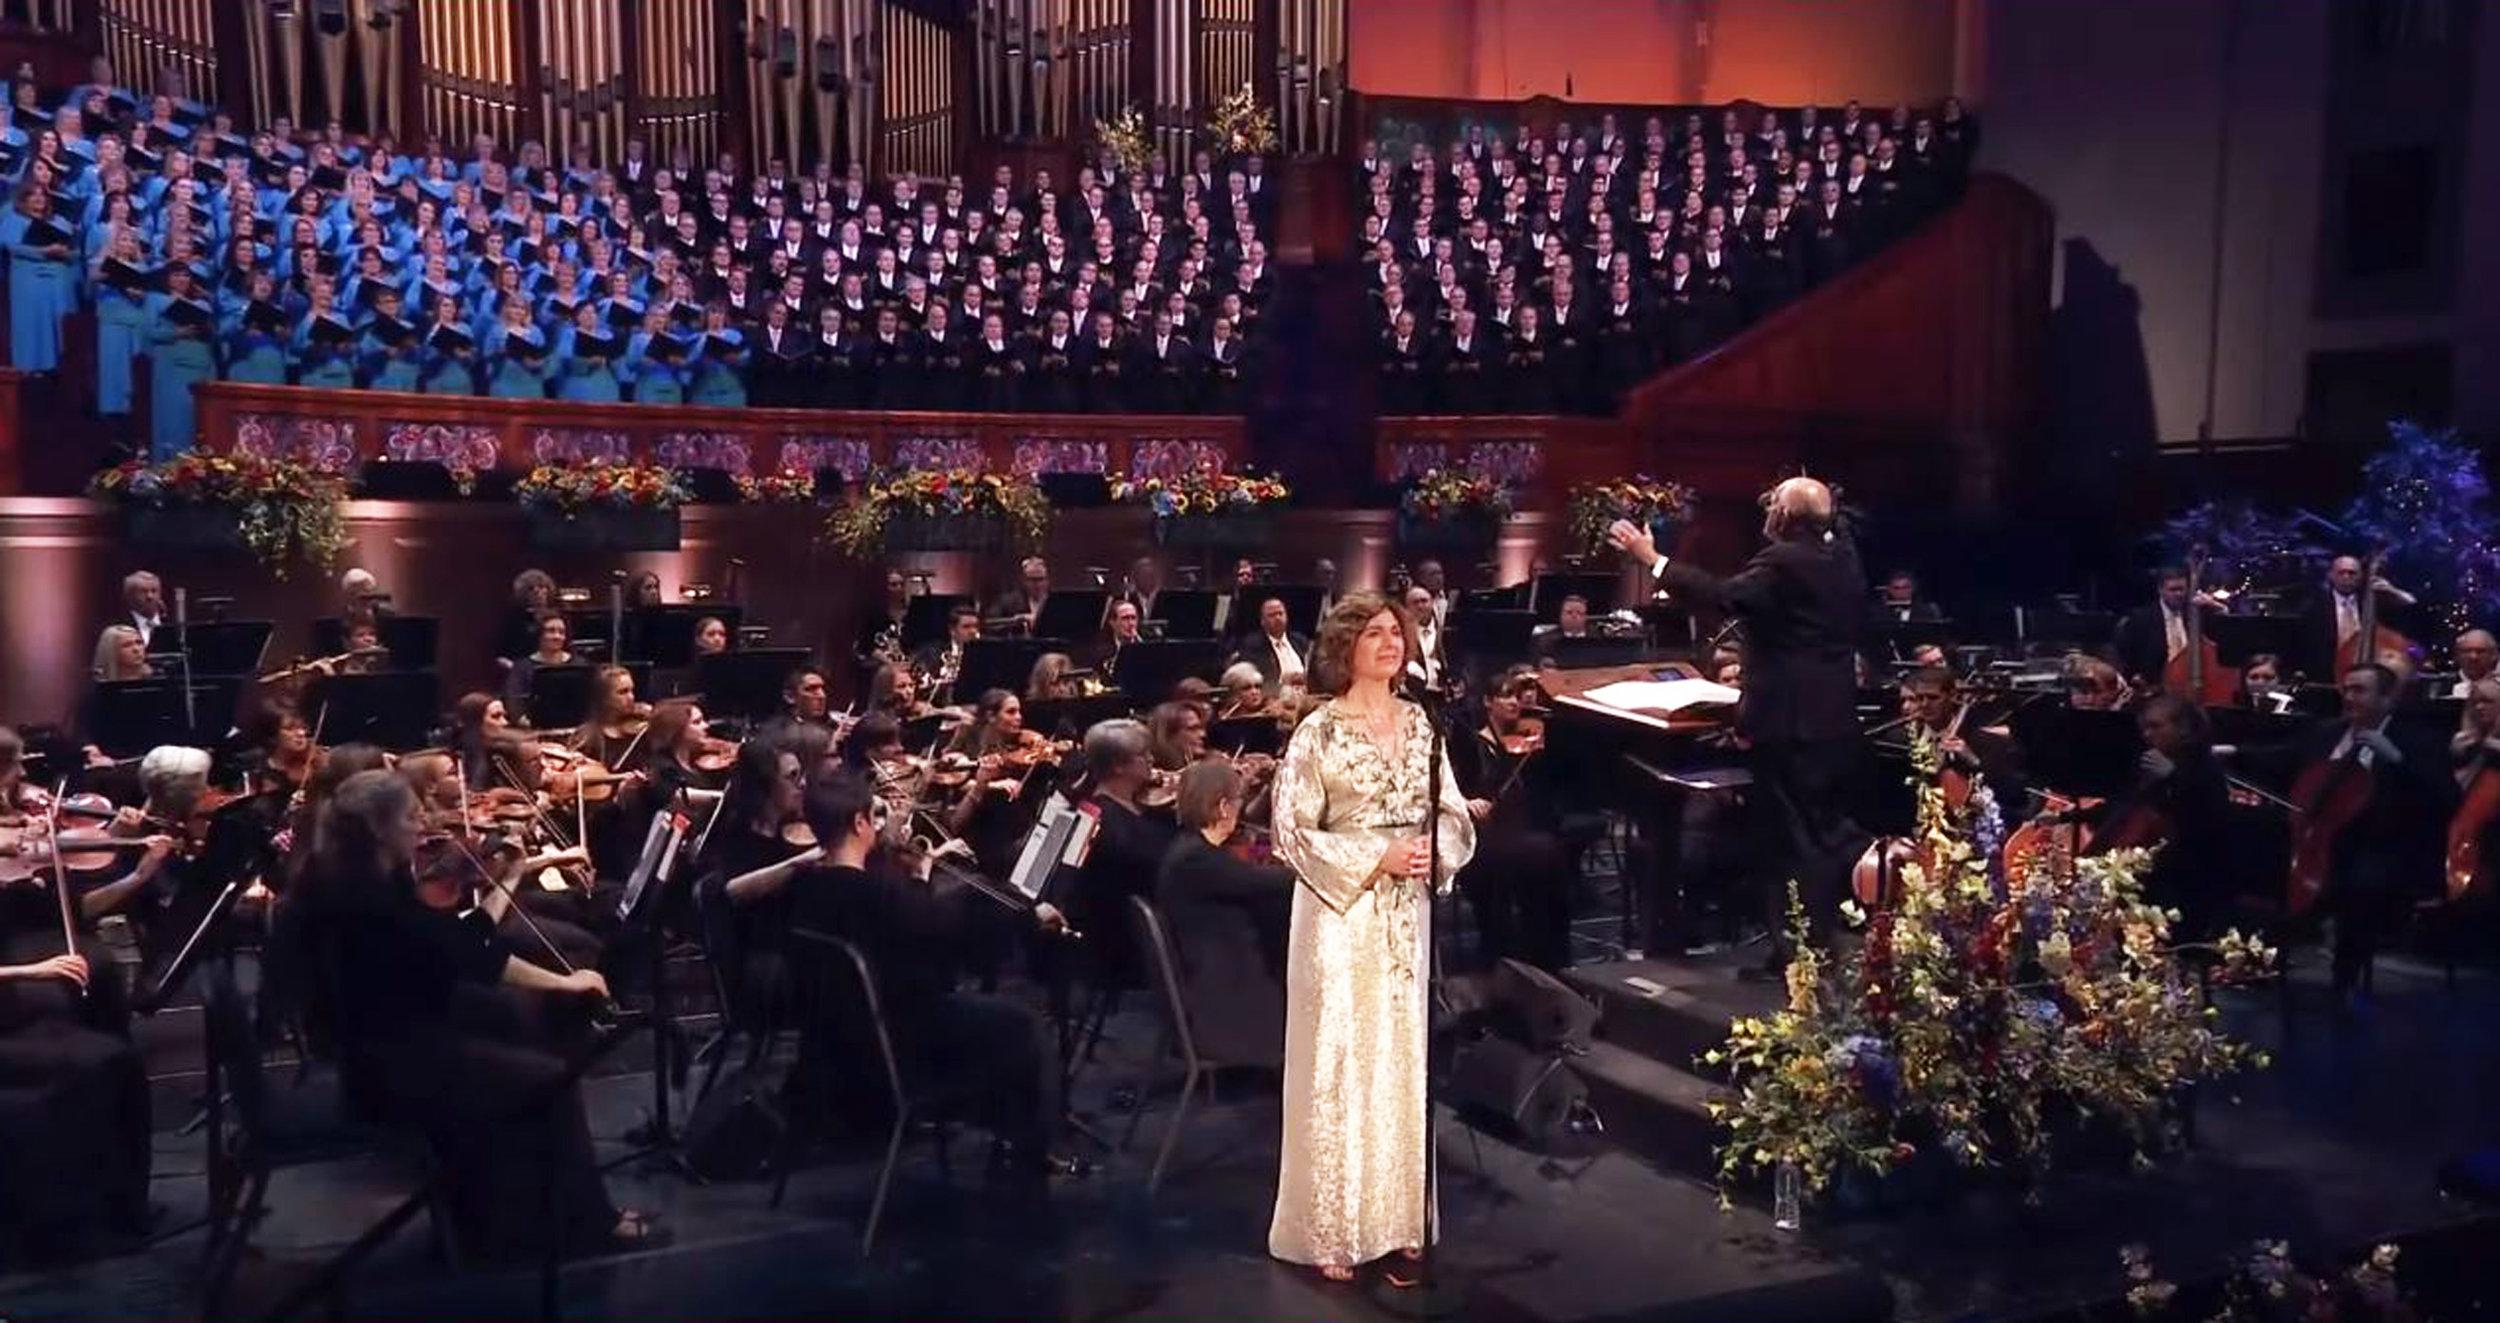 Sissel Concert - Jeannine Goeckeritz - Flute -Tabernacle Choir Orchestra Temple Square.jpg